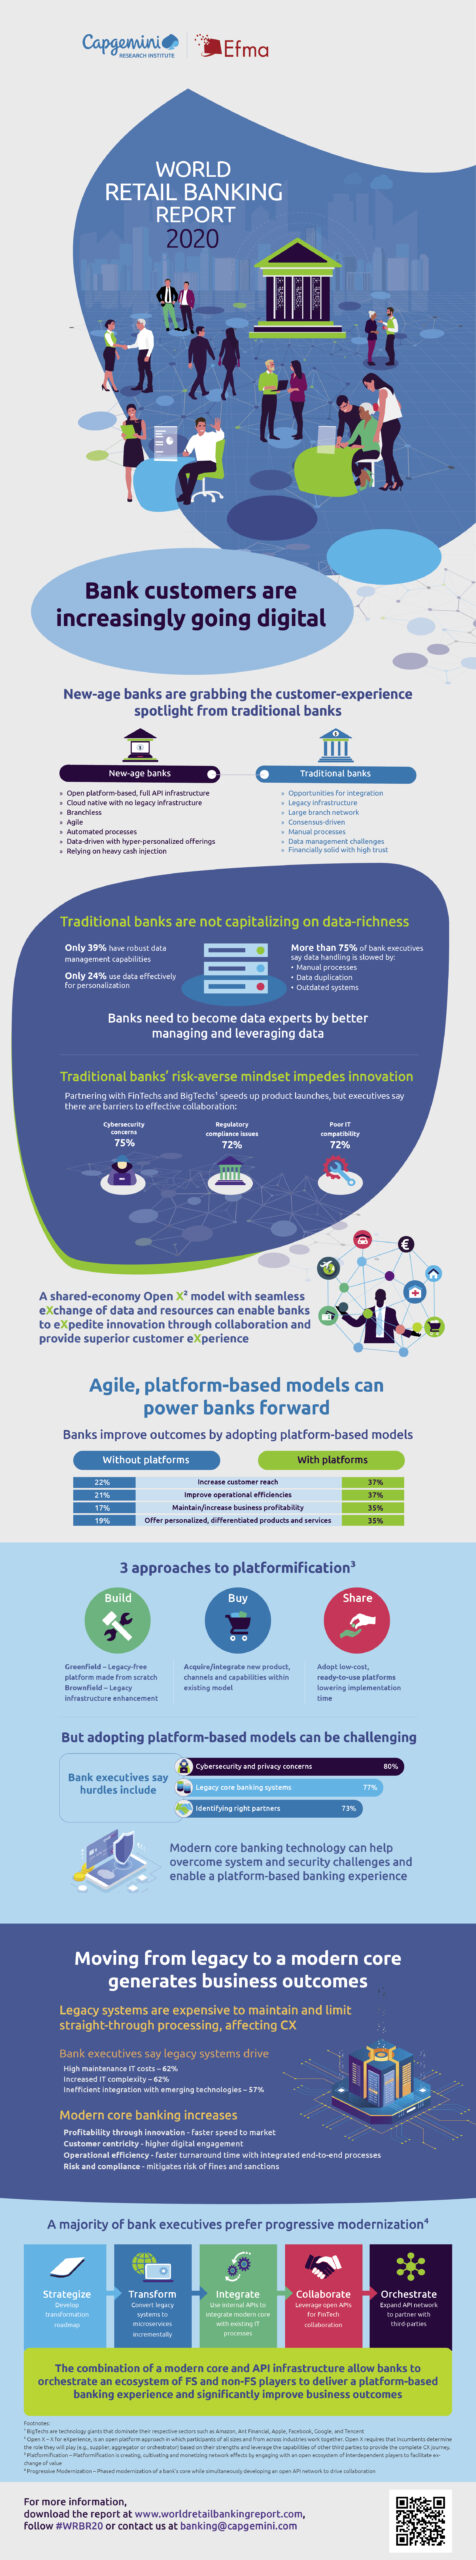 Infographic World Retail Banking Report 2020, Source- Capgemini, June 2020